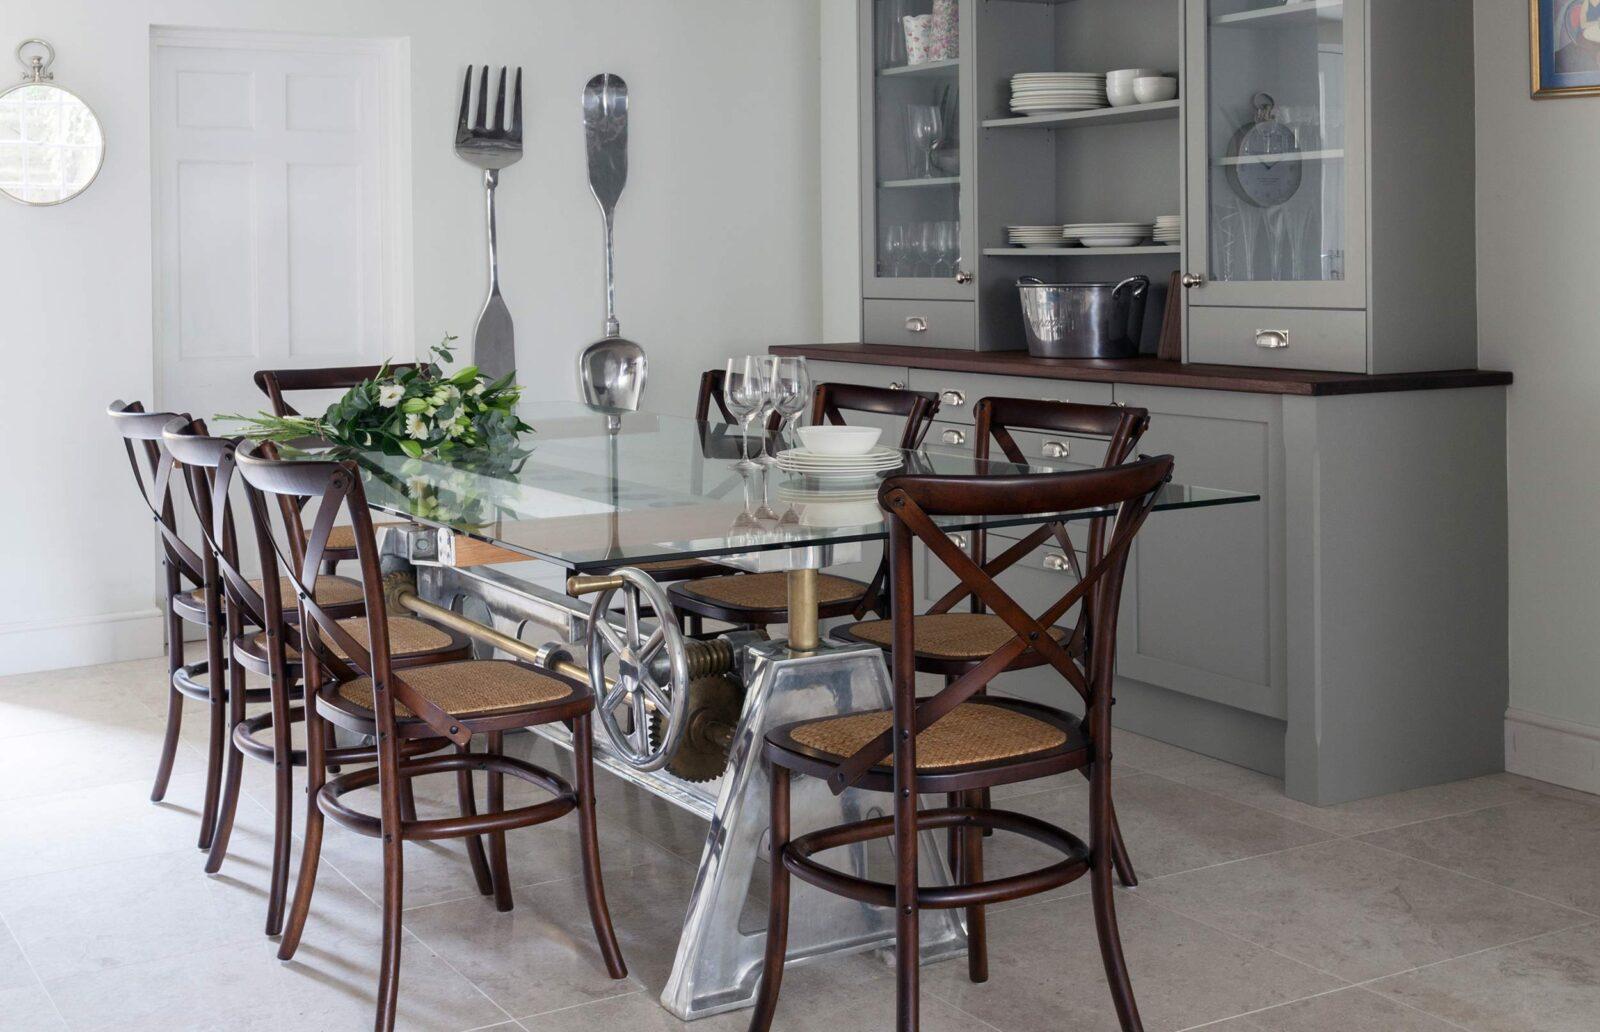 Bespoke Lifestyle Kitchen